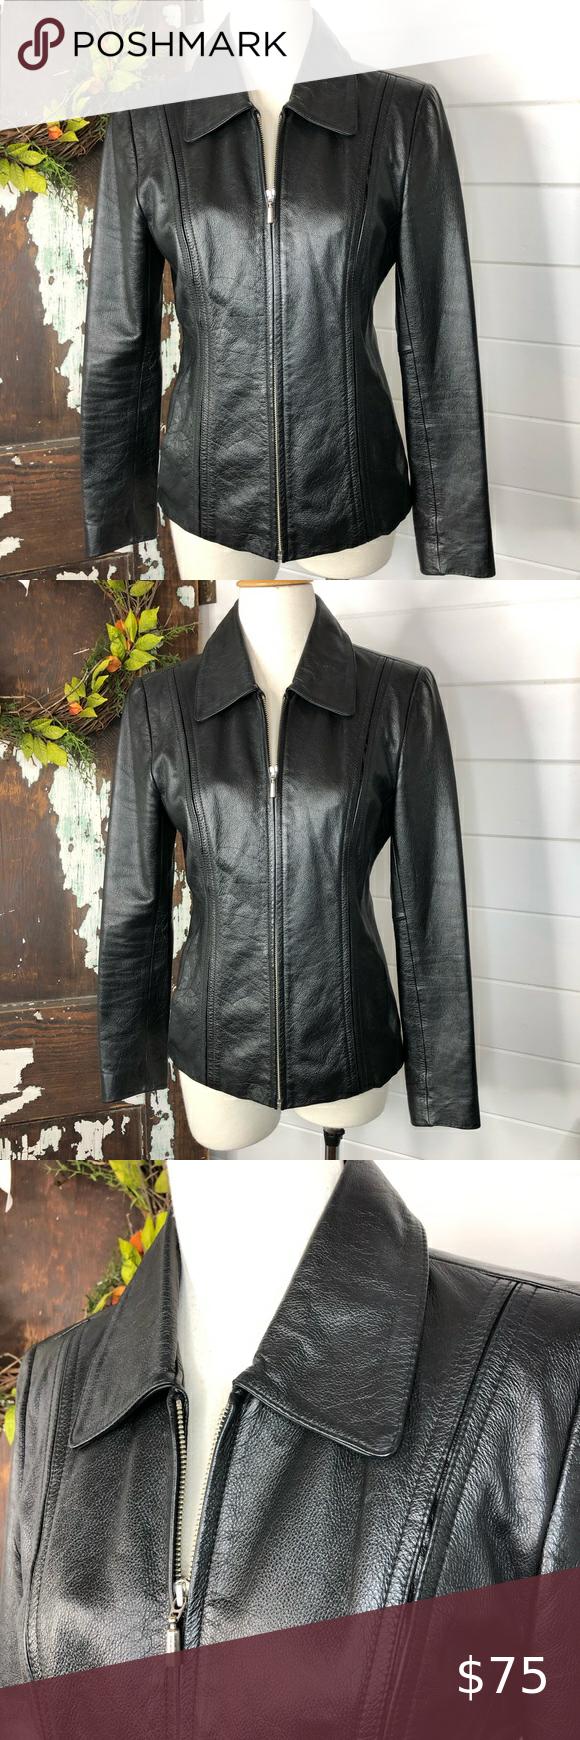 Jones New York Leather Jacket Leather Jacket White Leather Jacket Womens Black Leather Jacket [ 1740 x 580 Pixel ]